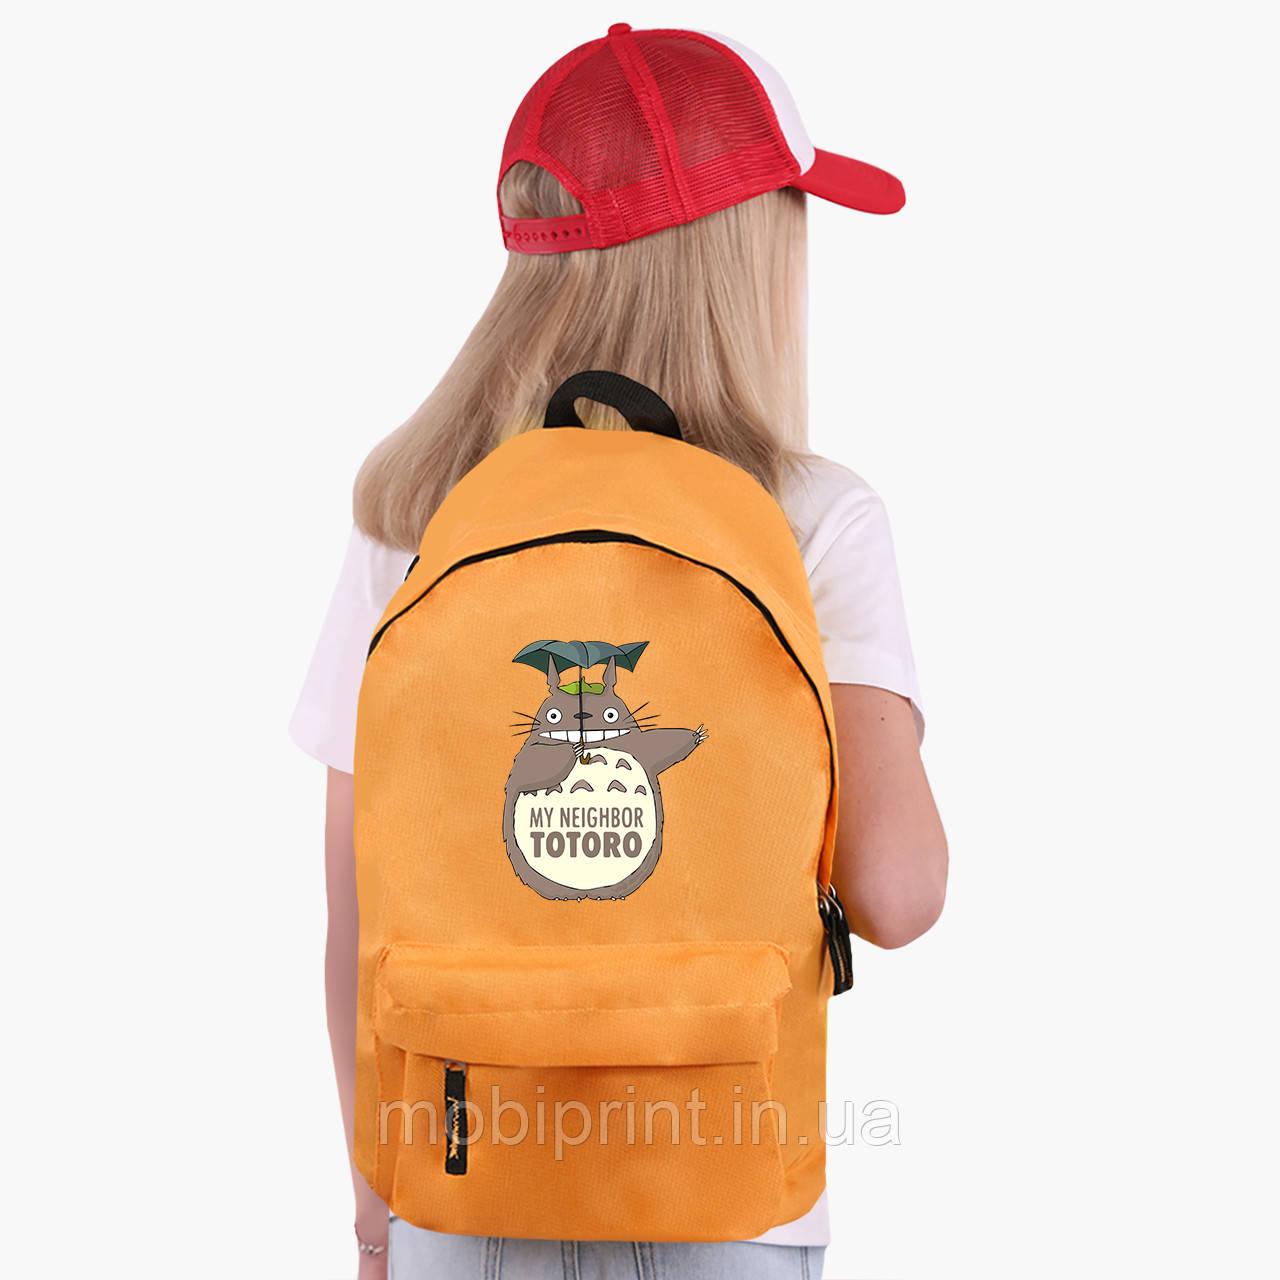 Детский рюкзак Мой сосед Тоторо (My Neighbor Totoro) (9263-2656)